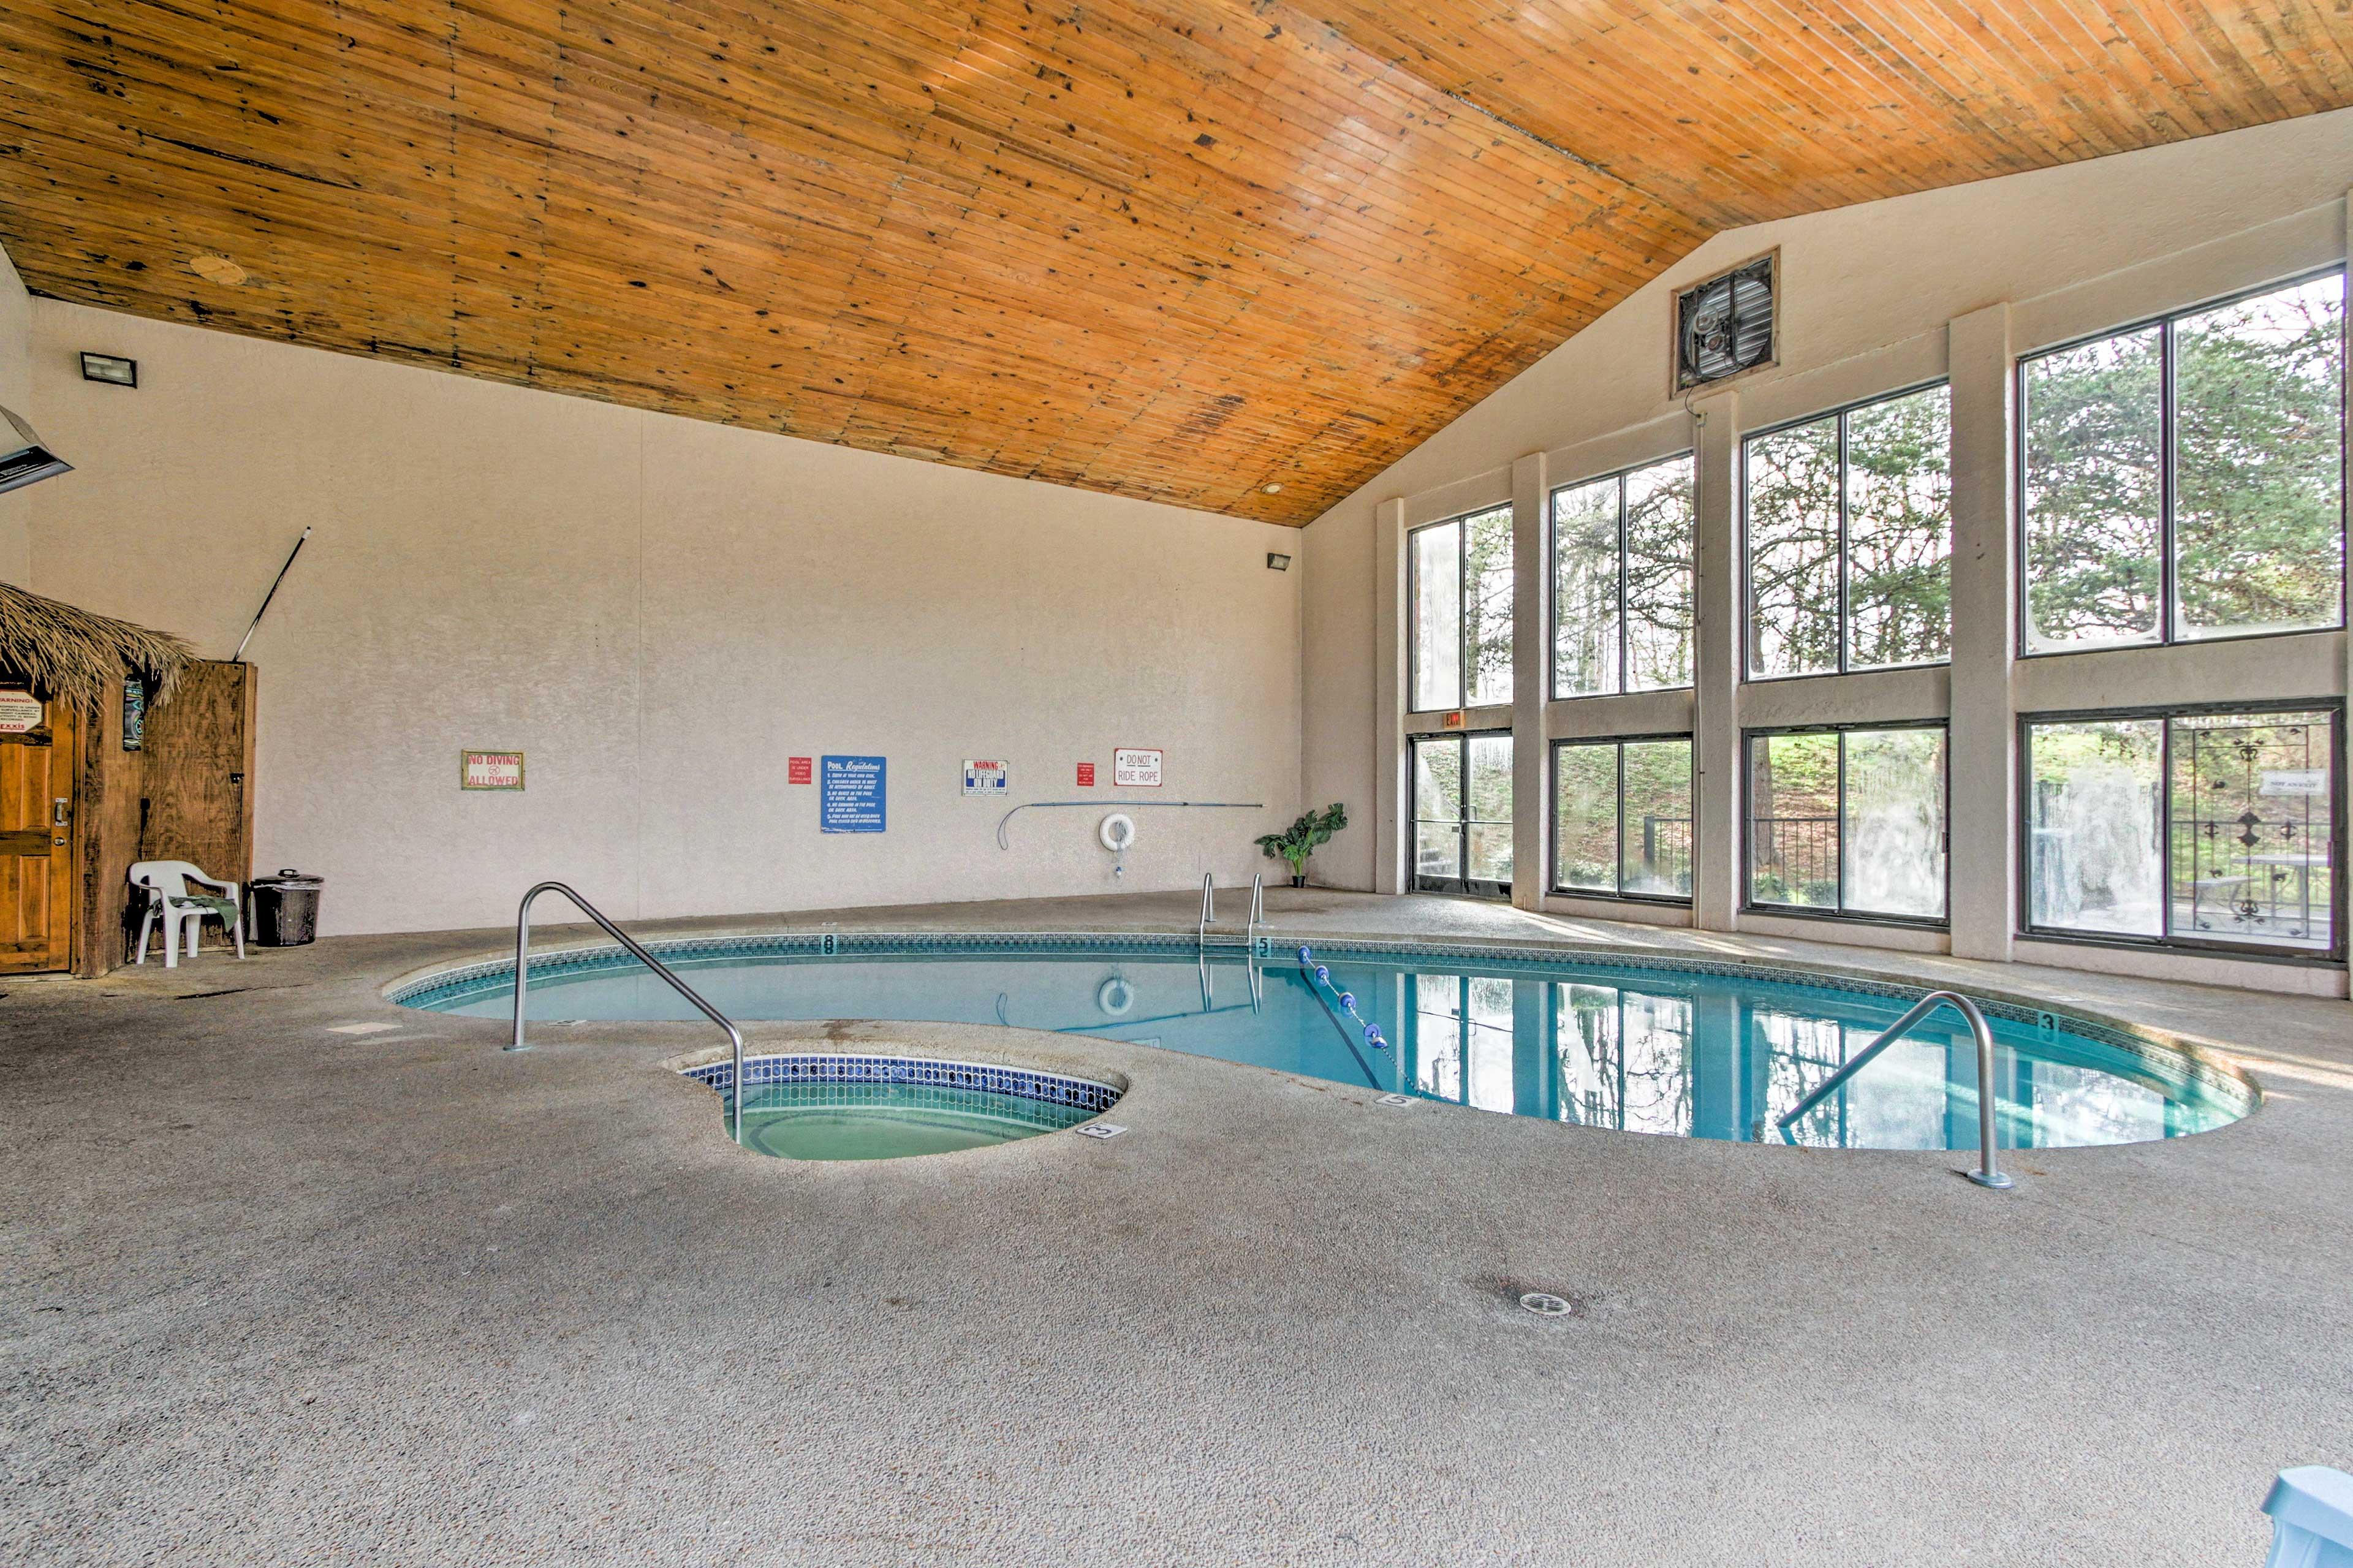 Take a dip in the heated pool, or a soak in the hot tub.